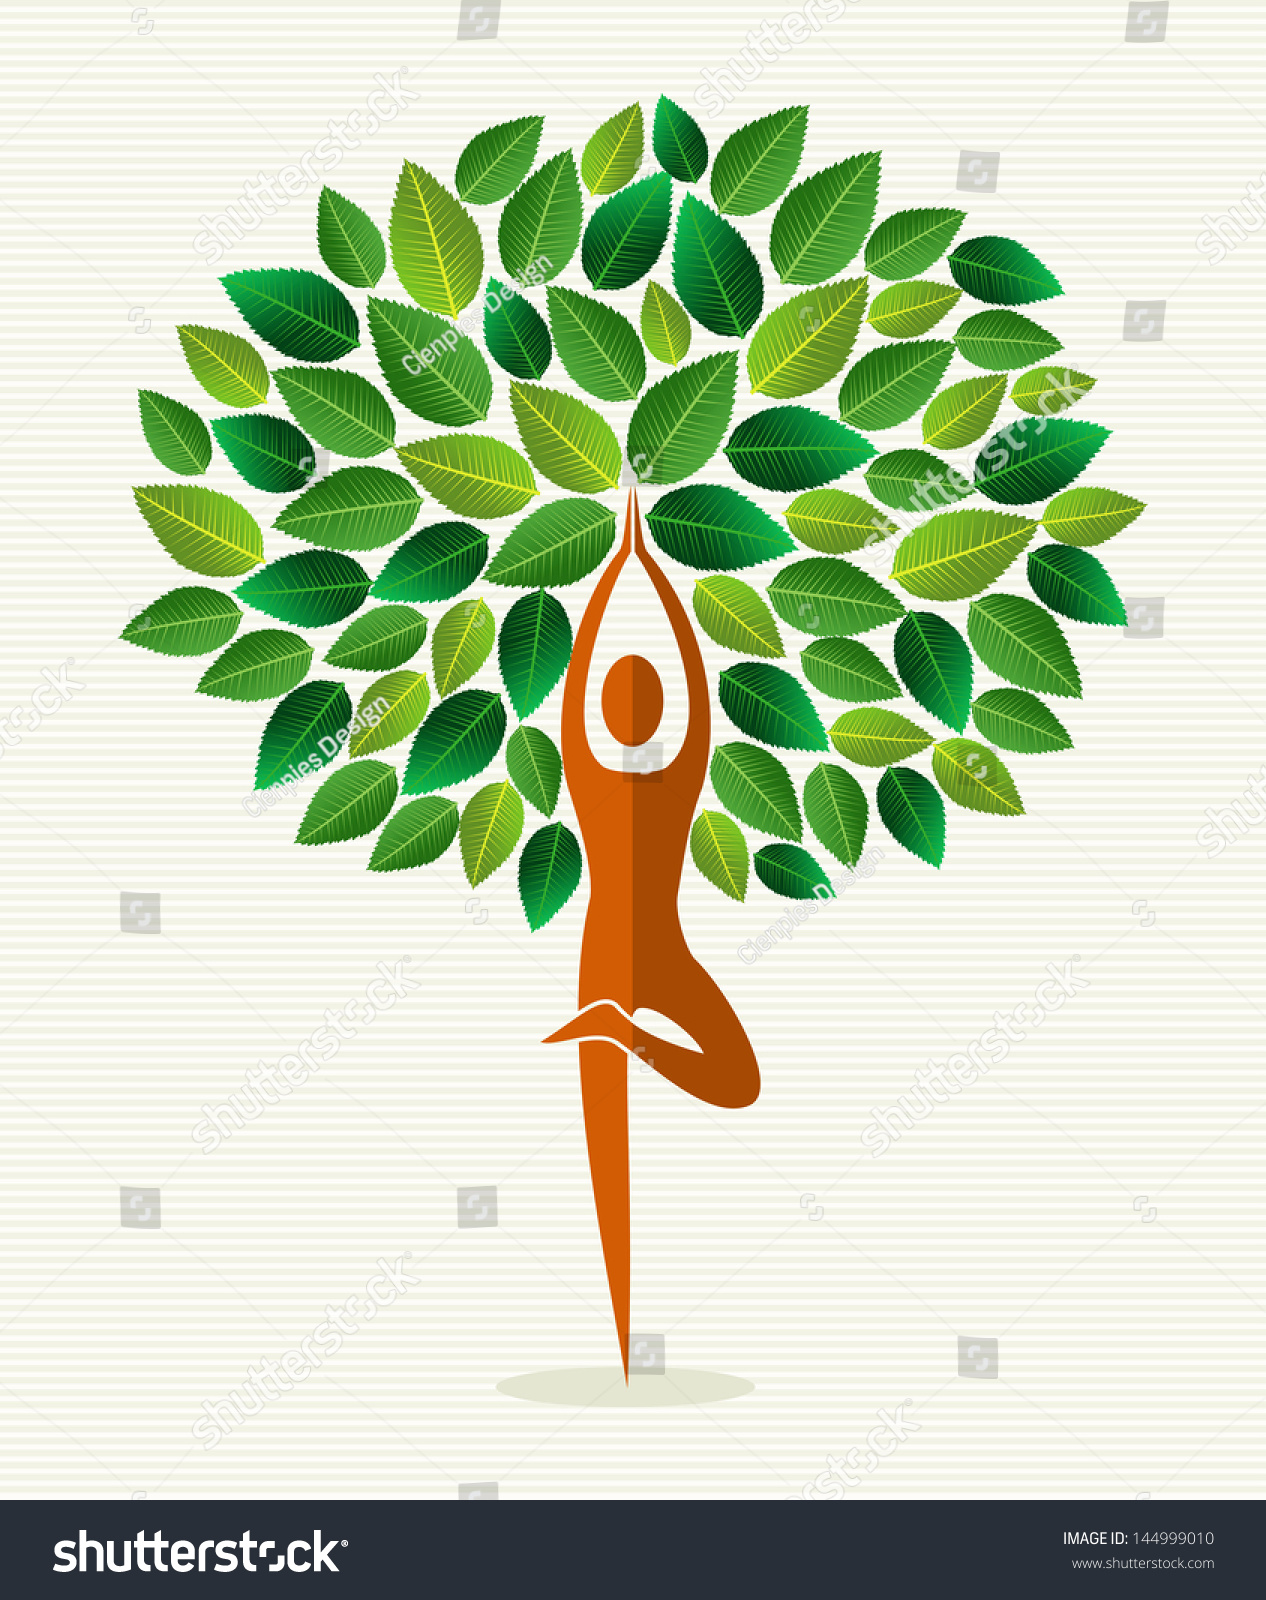 Human Shape Yoga Exercise Tree Design Stock Photo (Photo, Vector ...